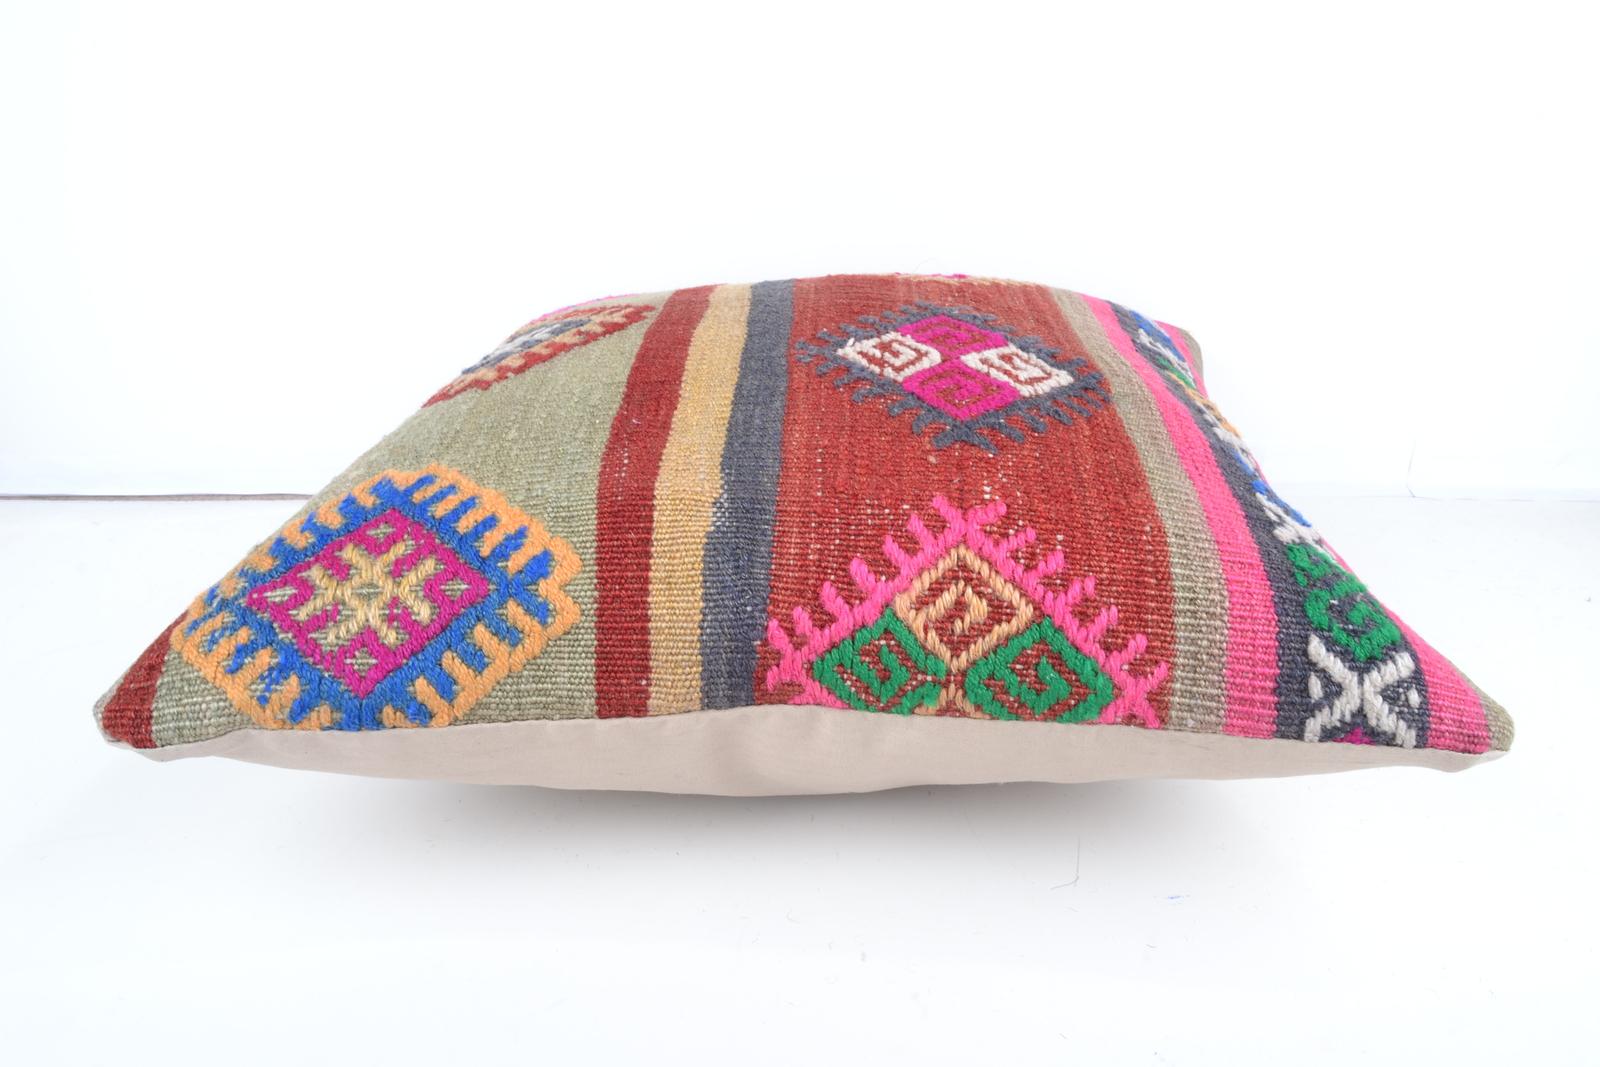 "16x16""antique throw pillow decorative pillow cushion salon decor oriental decor"